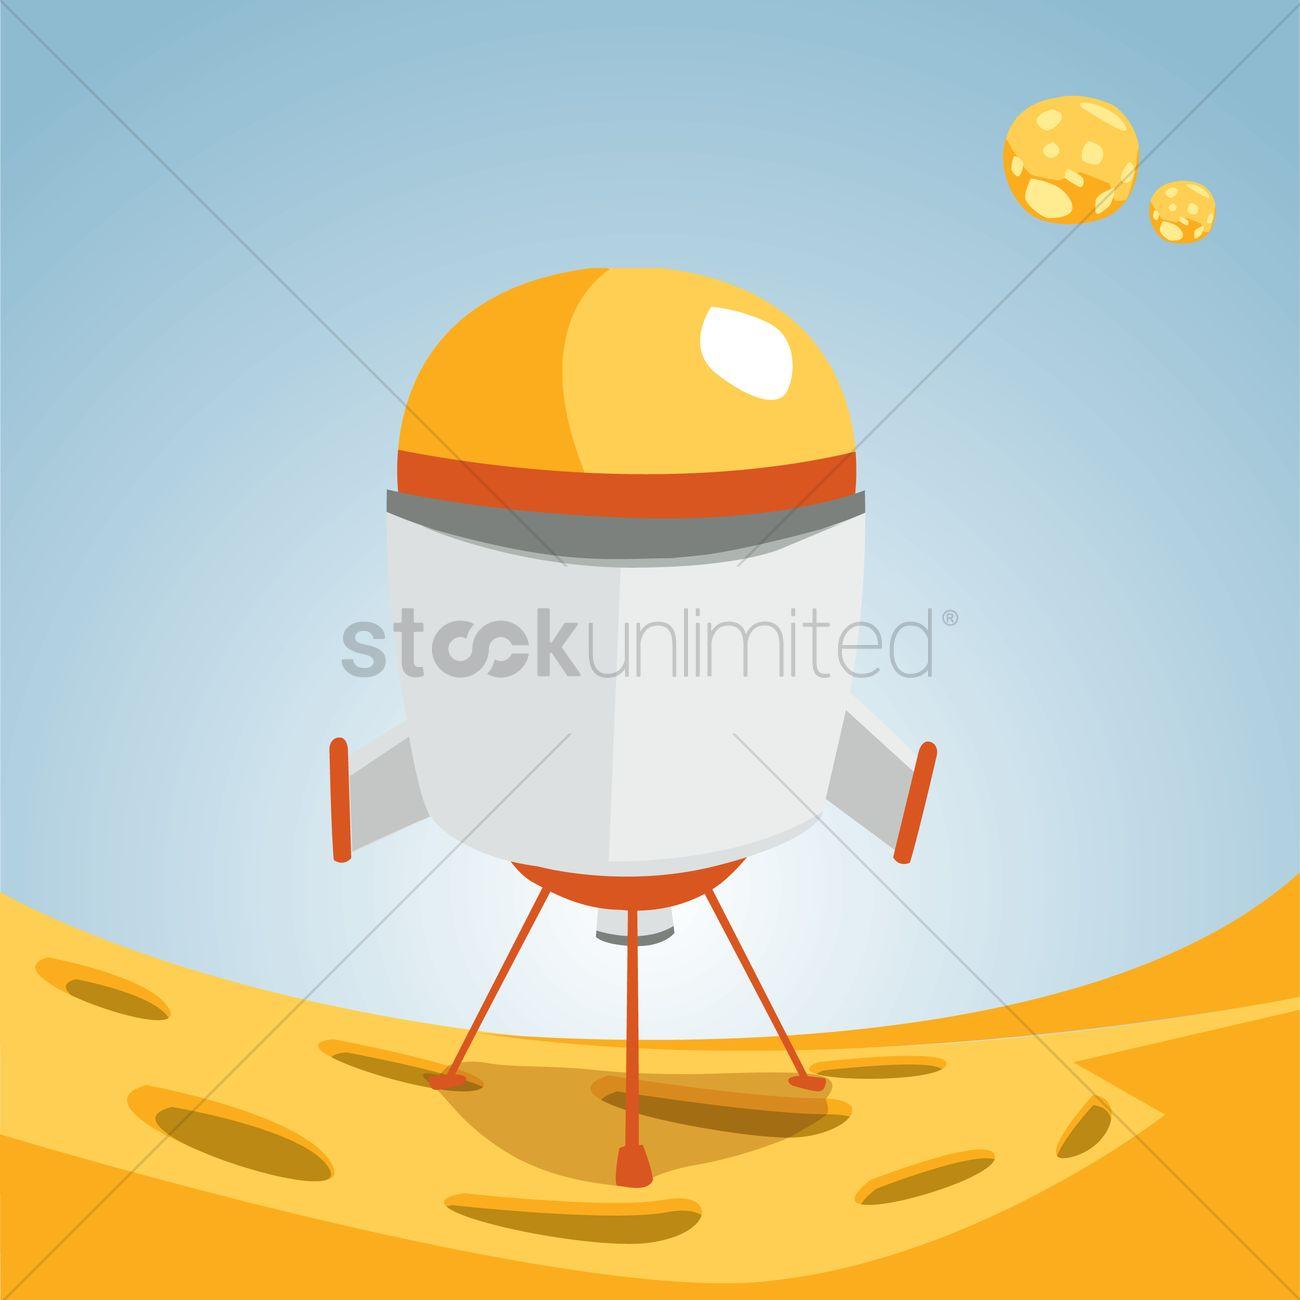 Landed space capsule Vector Image.